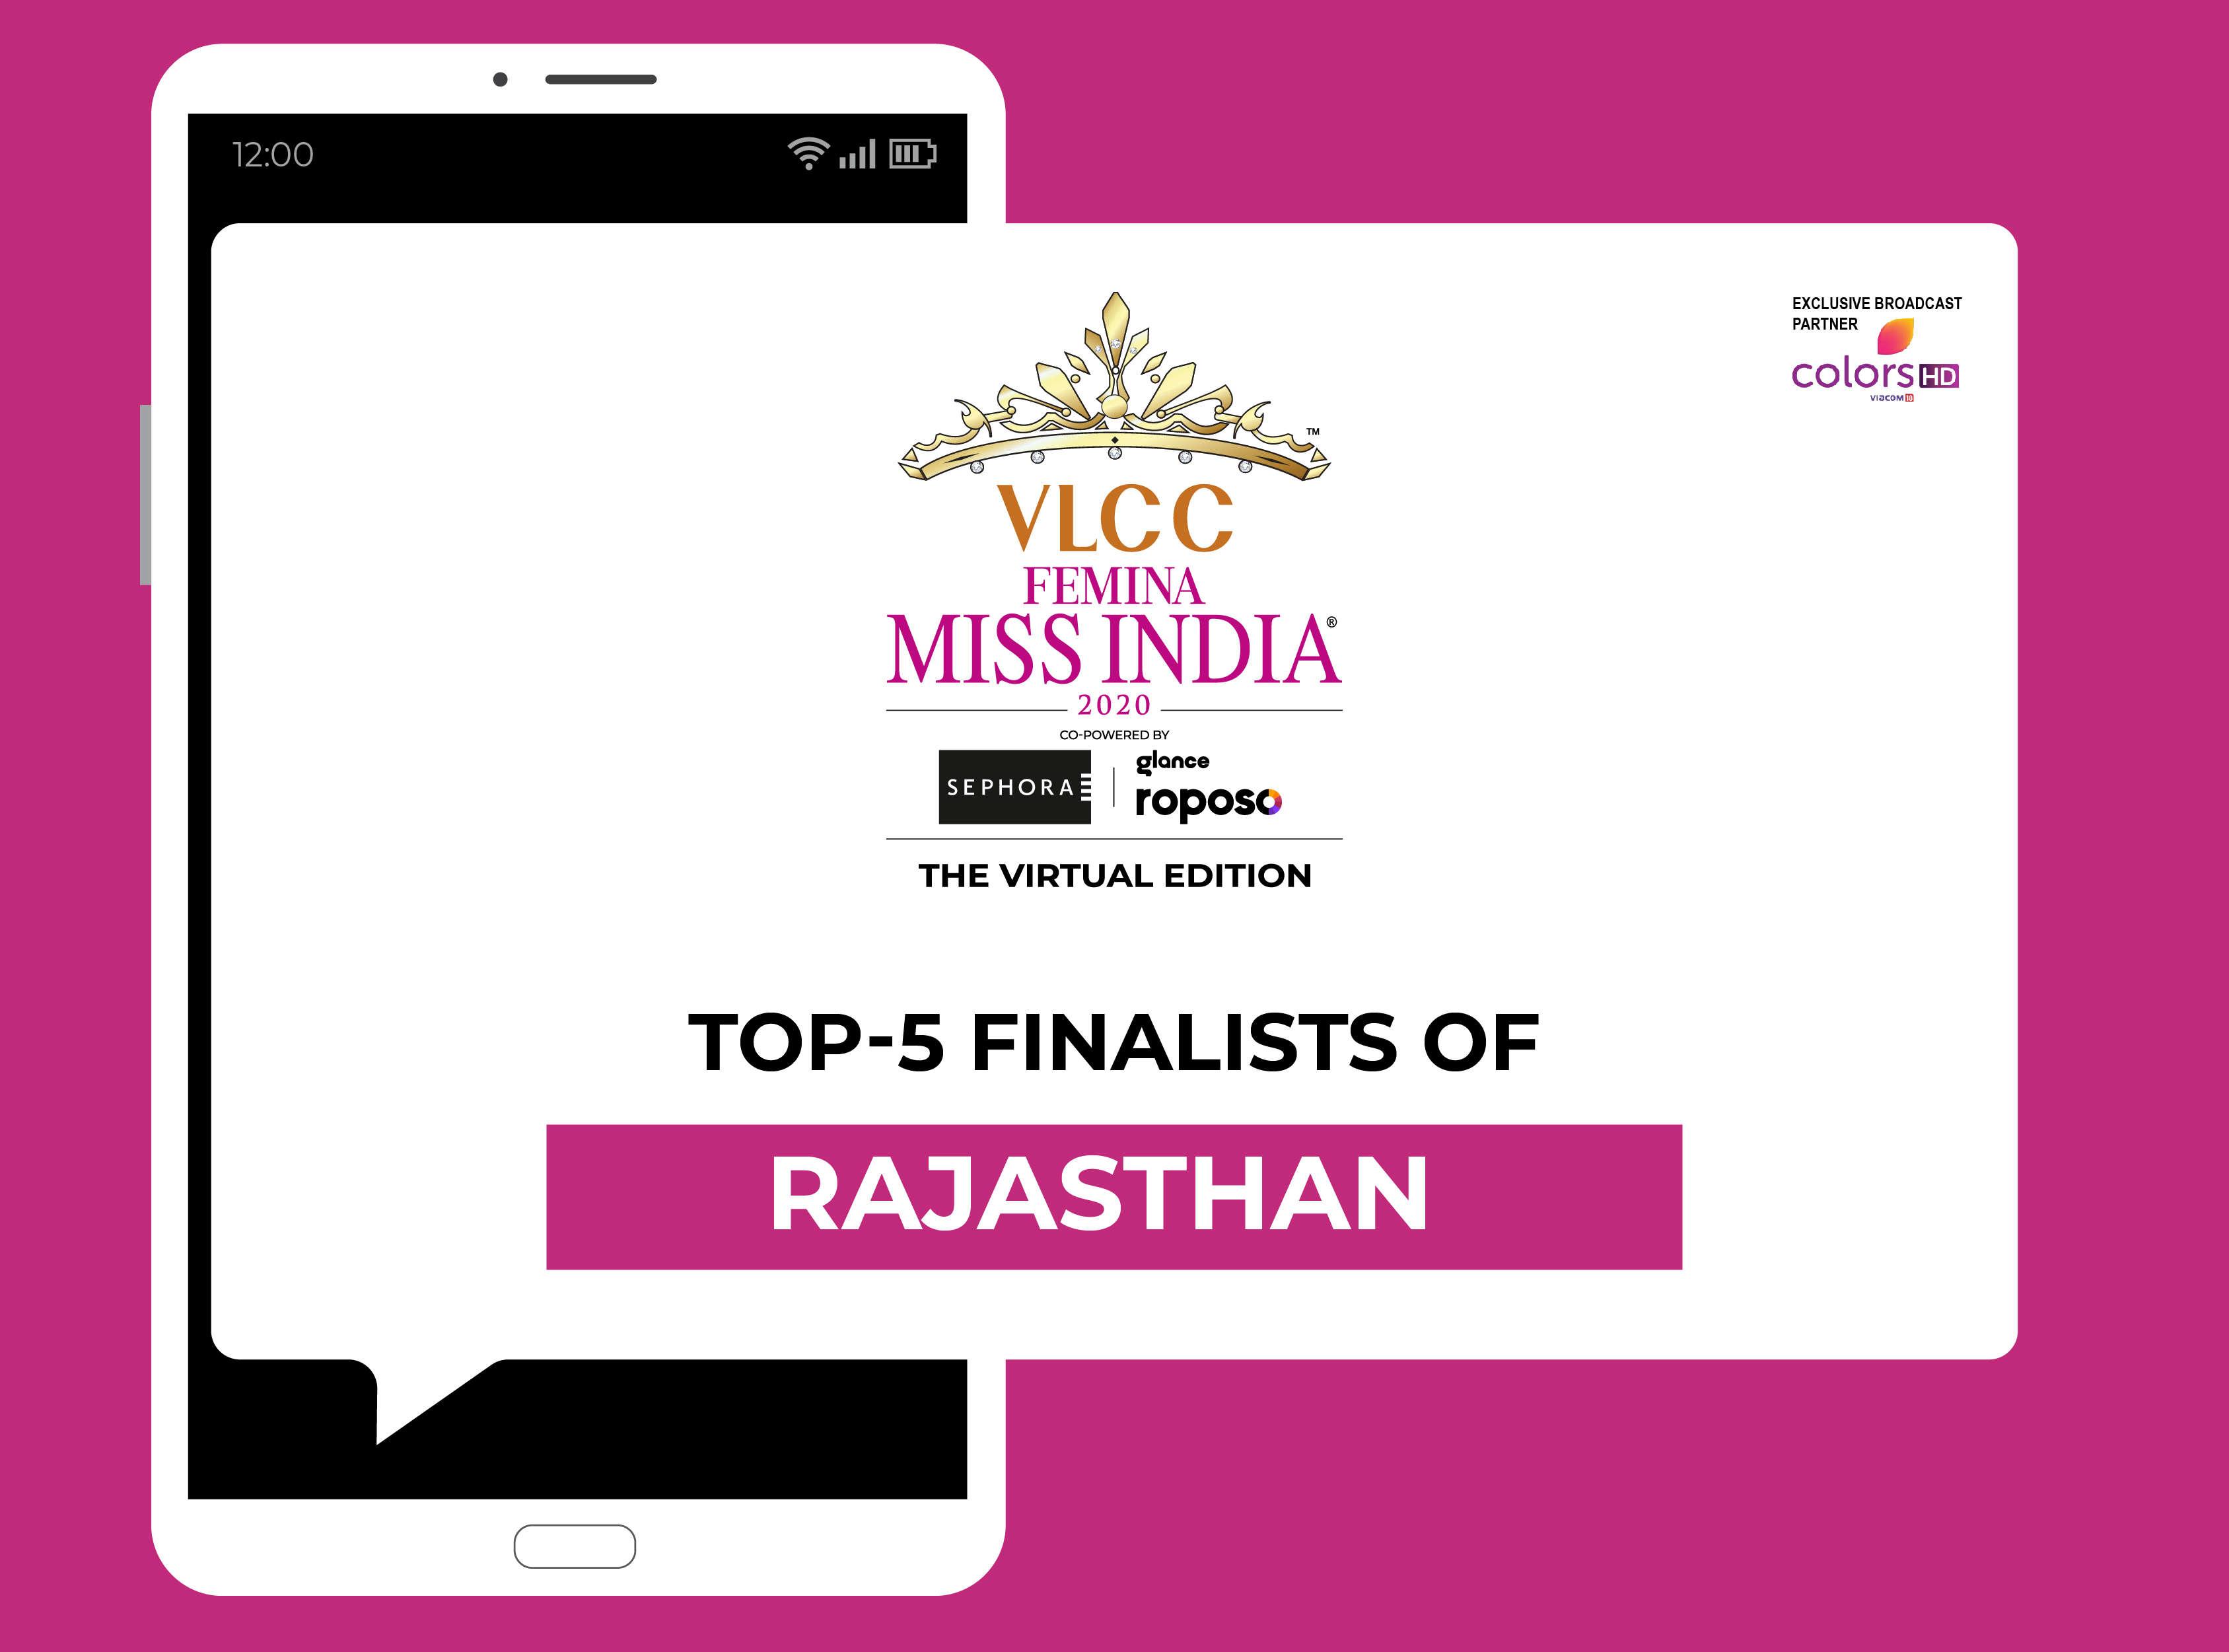 Introducing VLCC Femina Miss India Rajasthan 2020 Finalists!